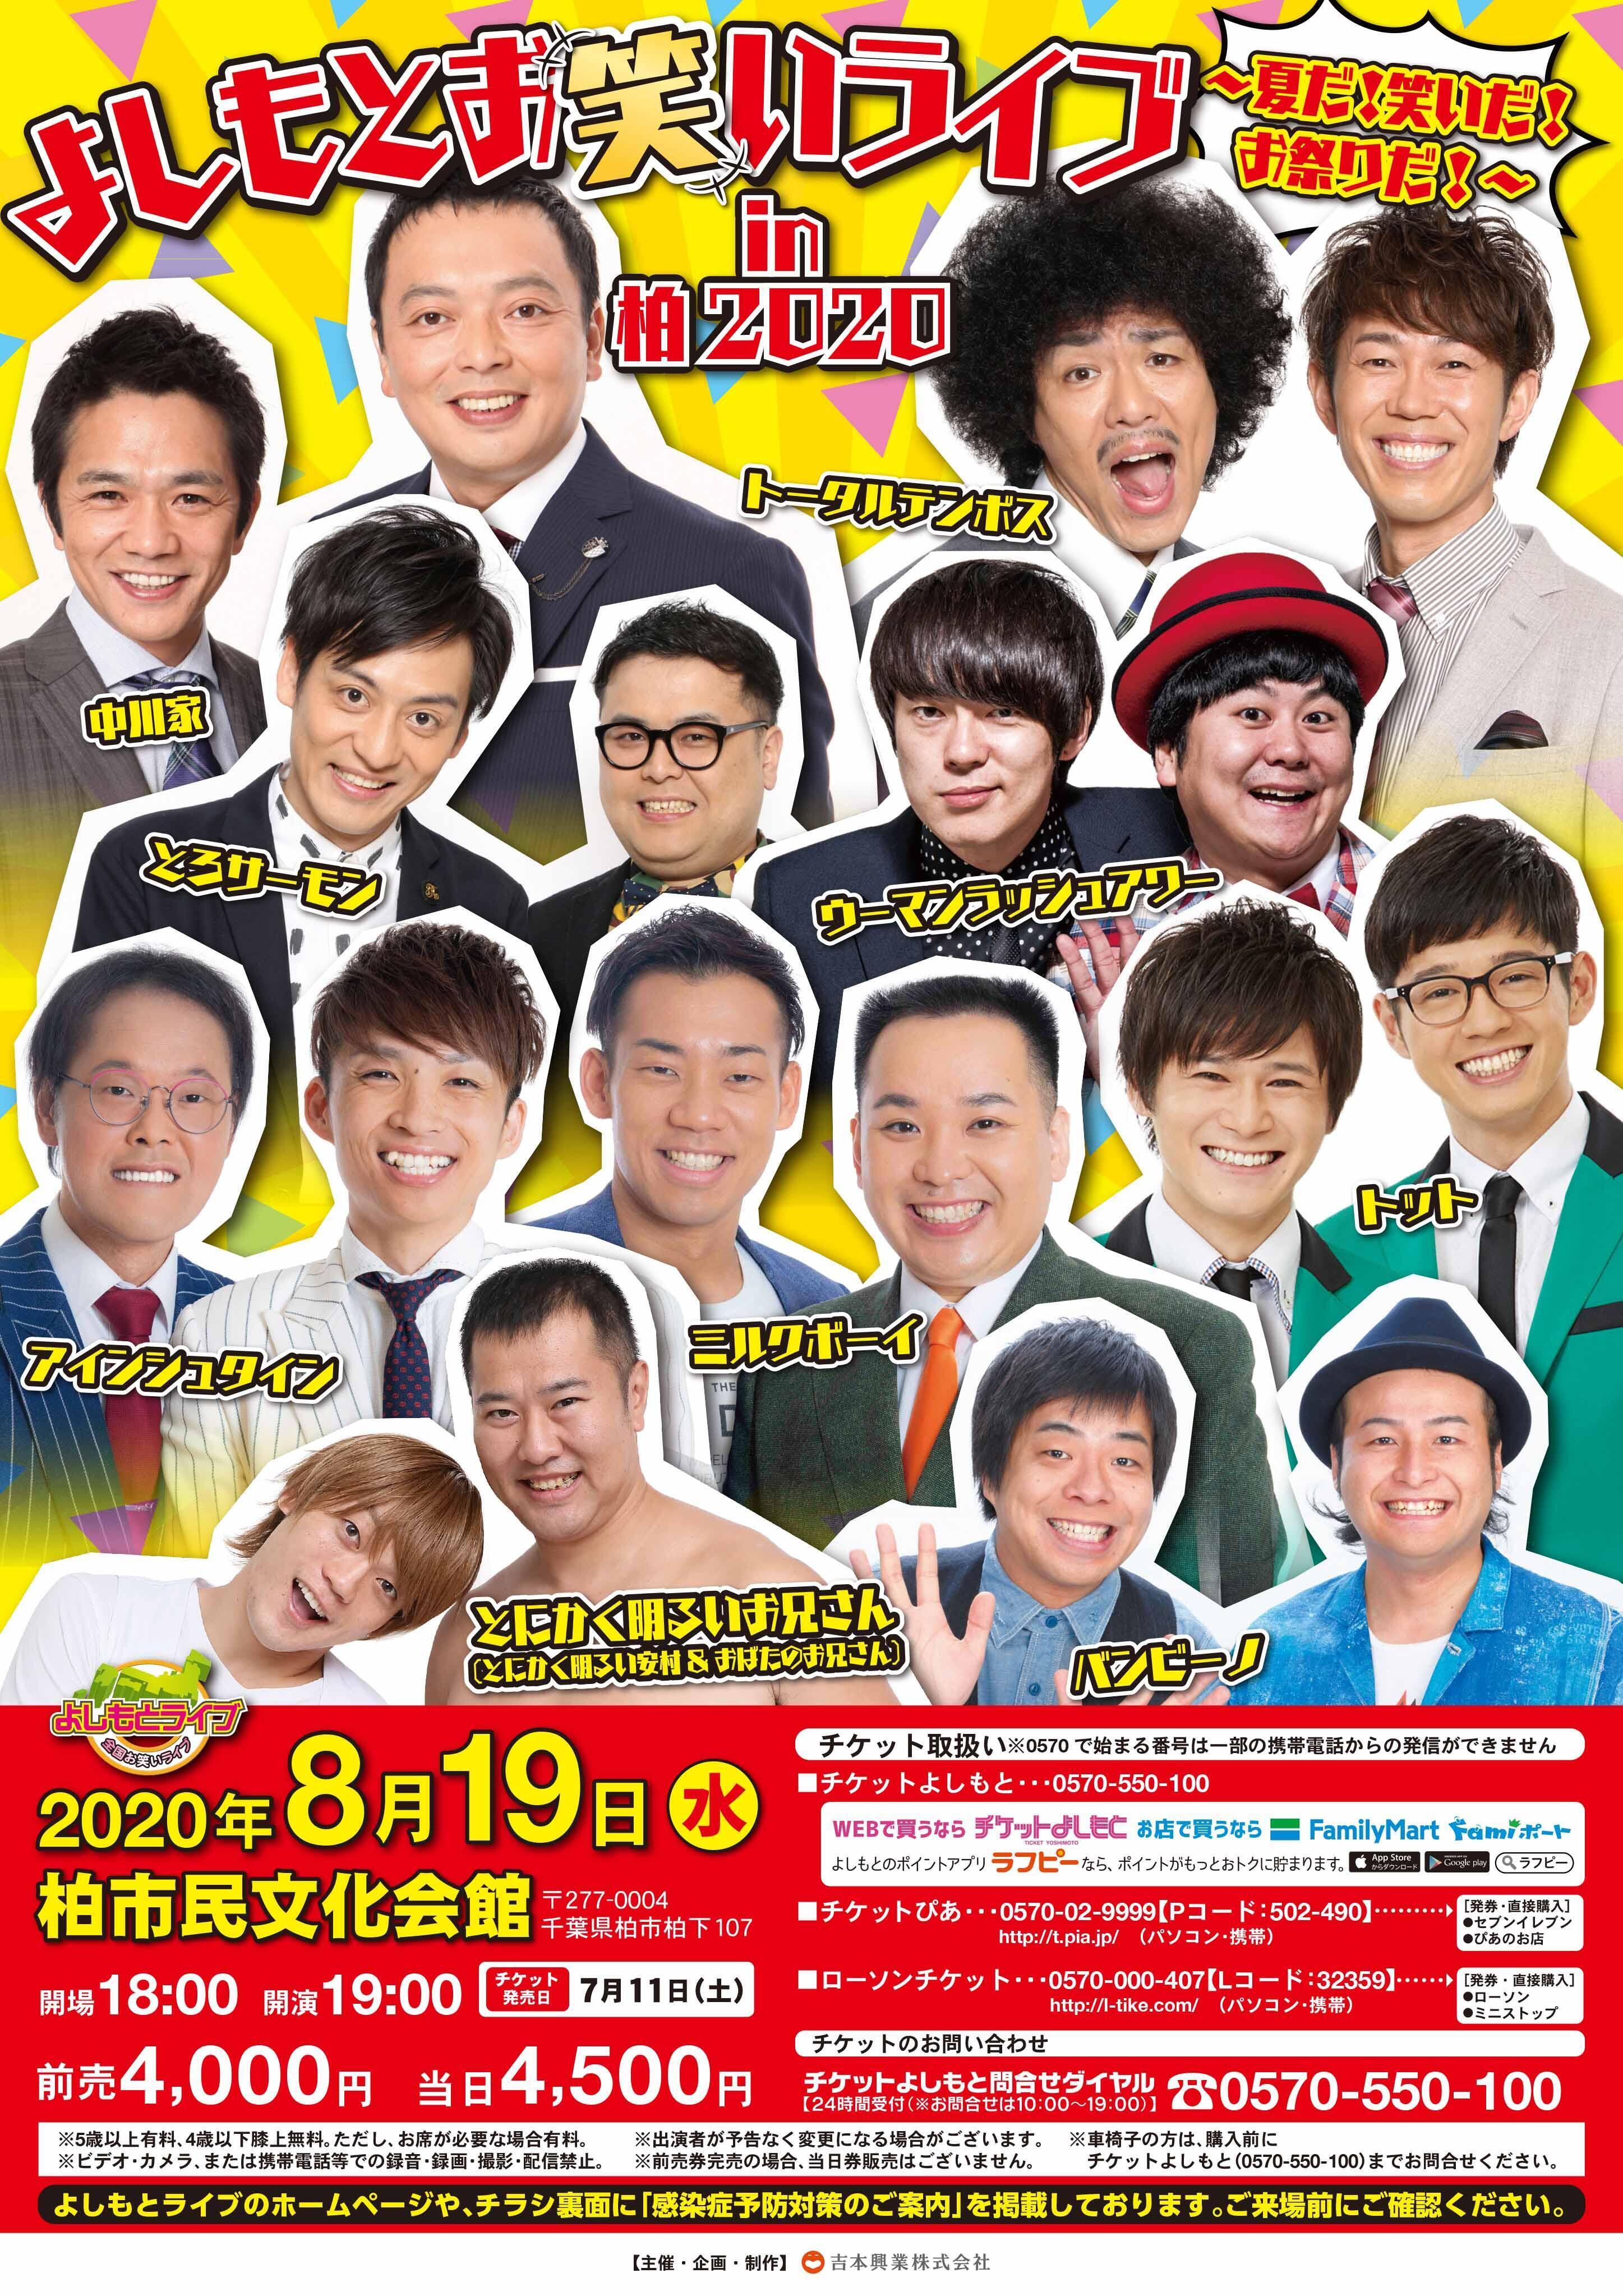 http://www.syumatsu.jp/20200706144810-7bb8b47fff8a1c92c1f12d4307afb7f79a9d6c80.jpg